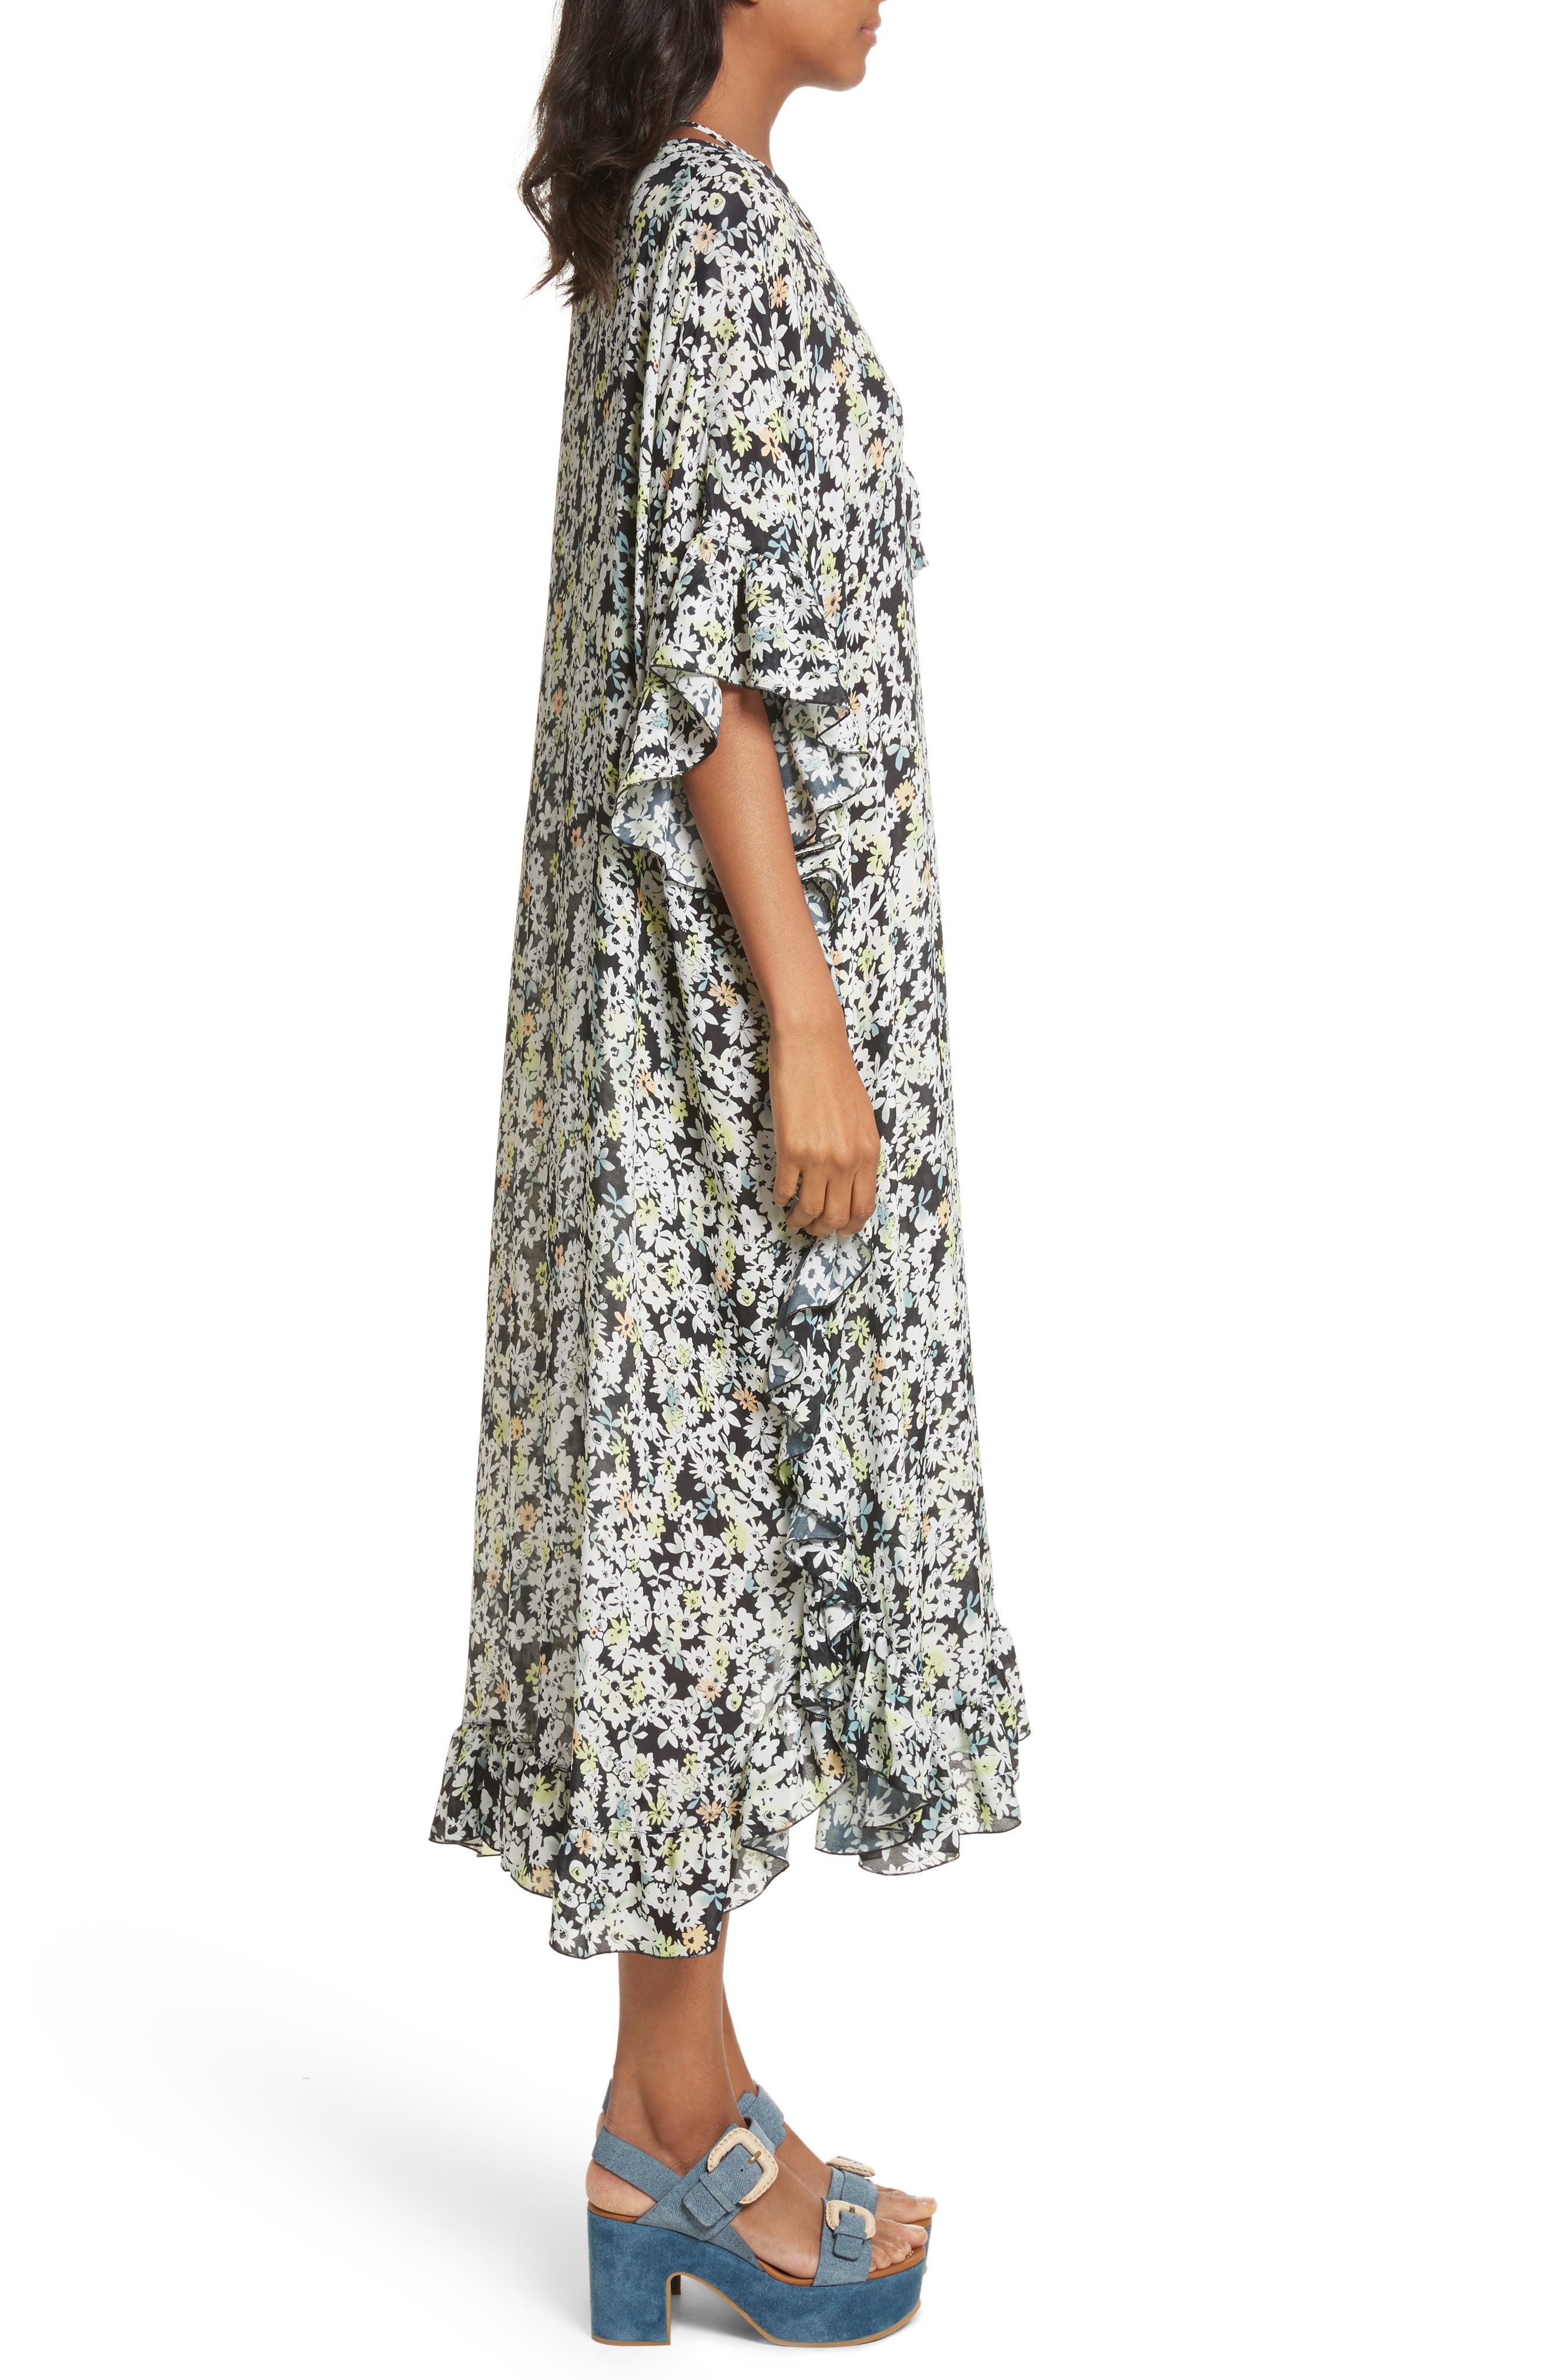 SEE BY CHLOÉ,                             Floral Print Flutter Edge Dress,                             Alternate thumbnail 3, color,                             021